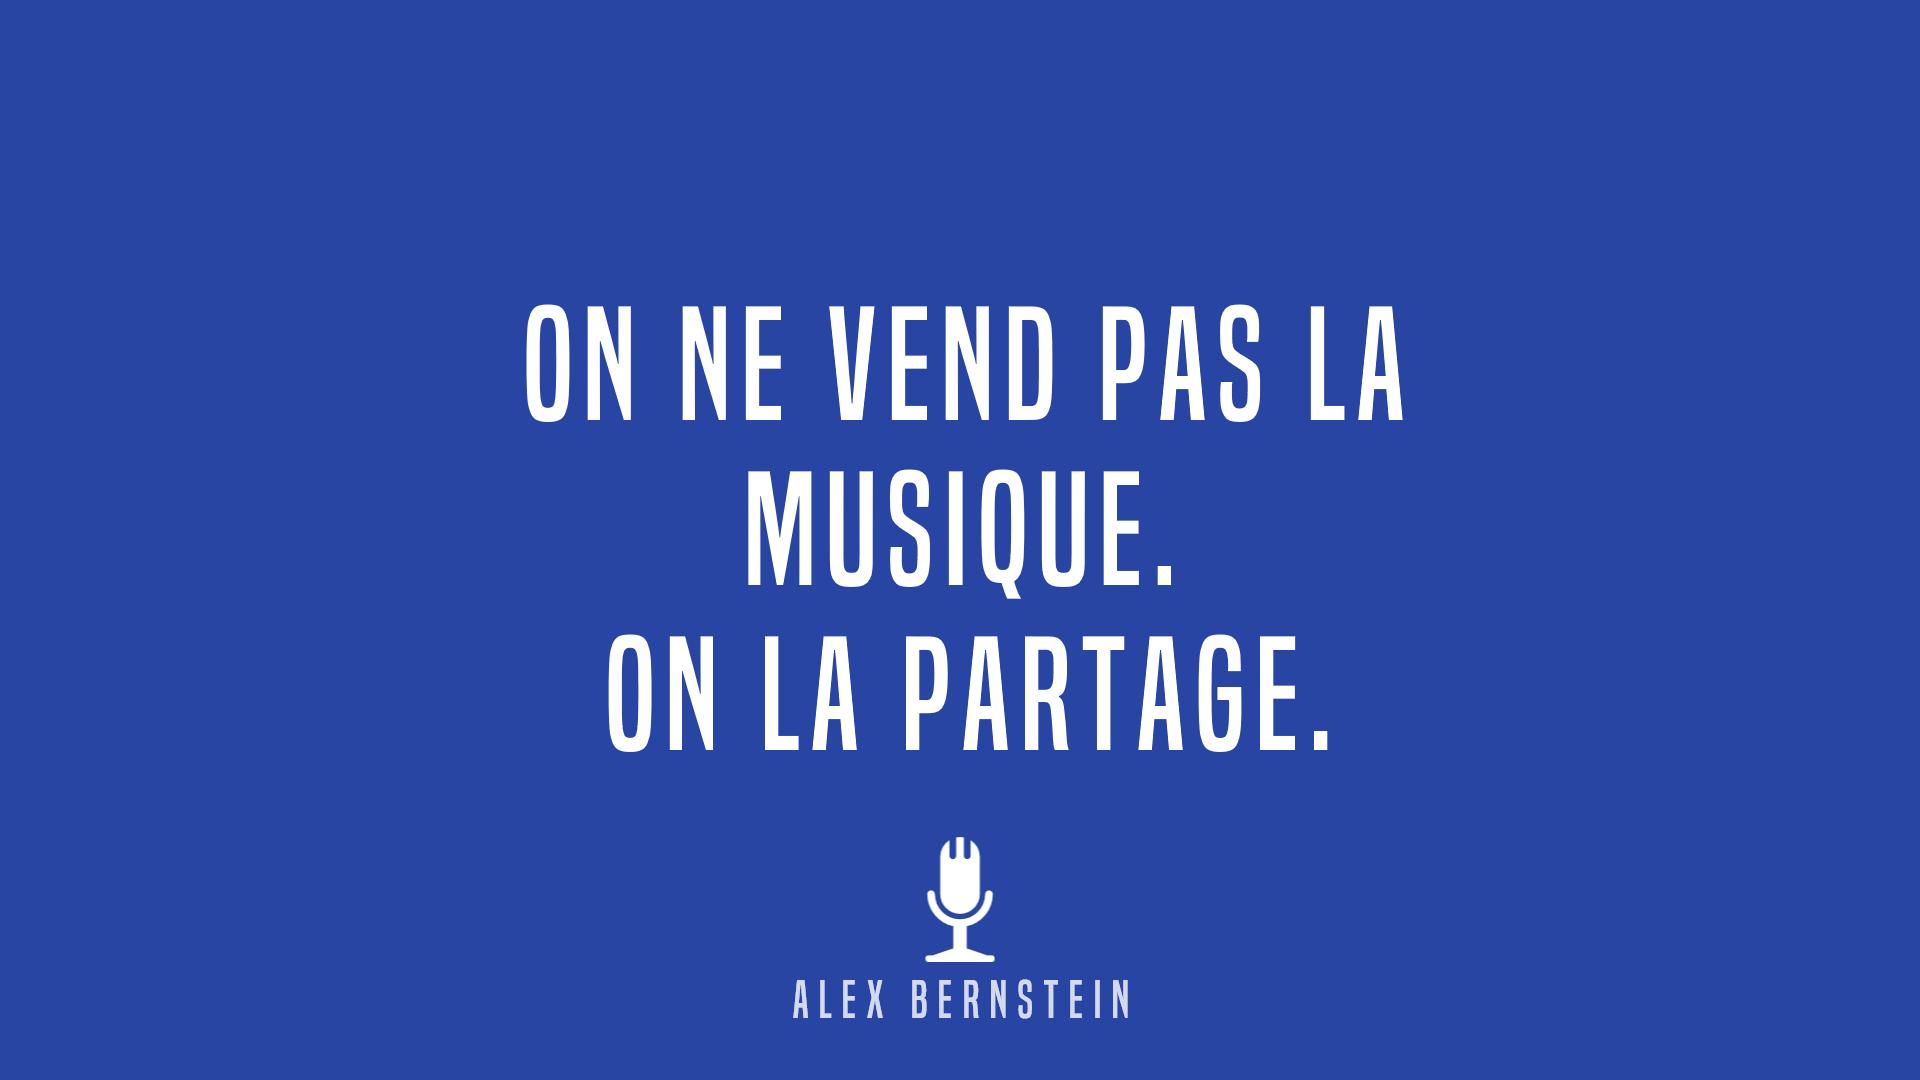 Quote, Wording, Saying, Blue,  Free Image